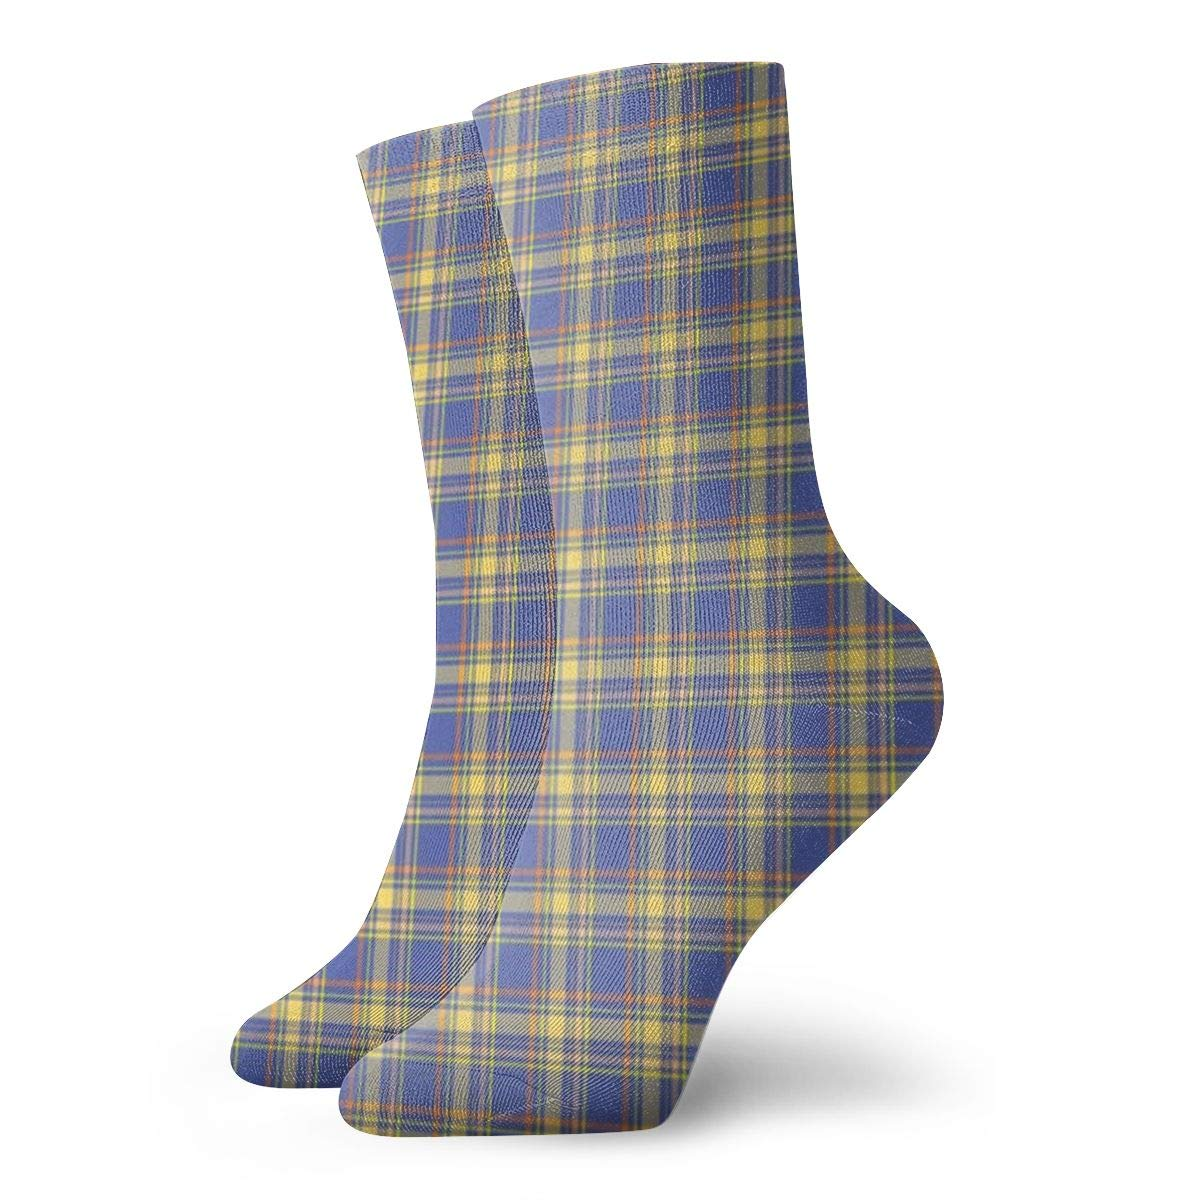 Blue-Plaid Unisex Funny Casual Crew Socks Athletic Socks For Boys Girls Kids Teenagers